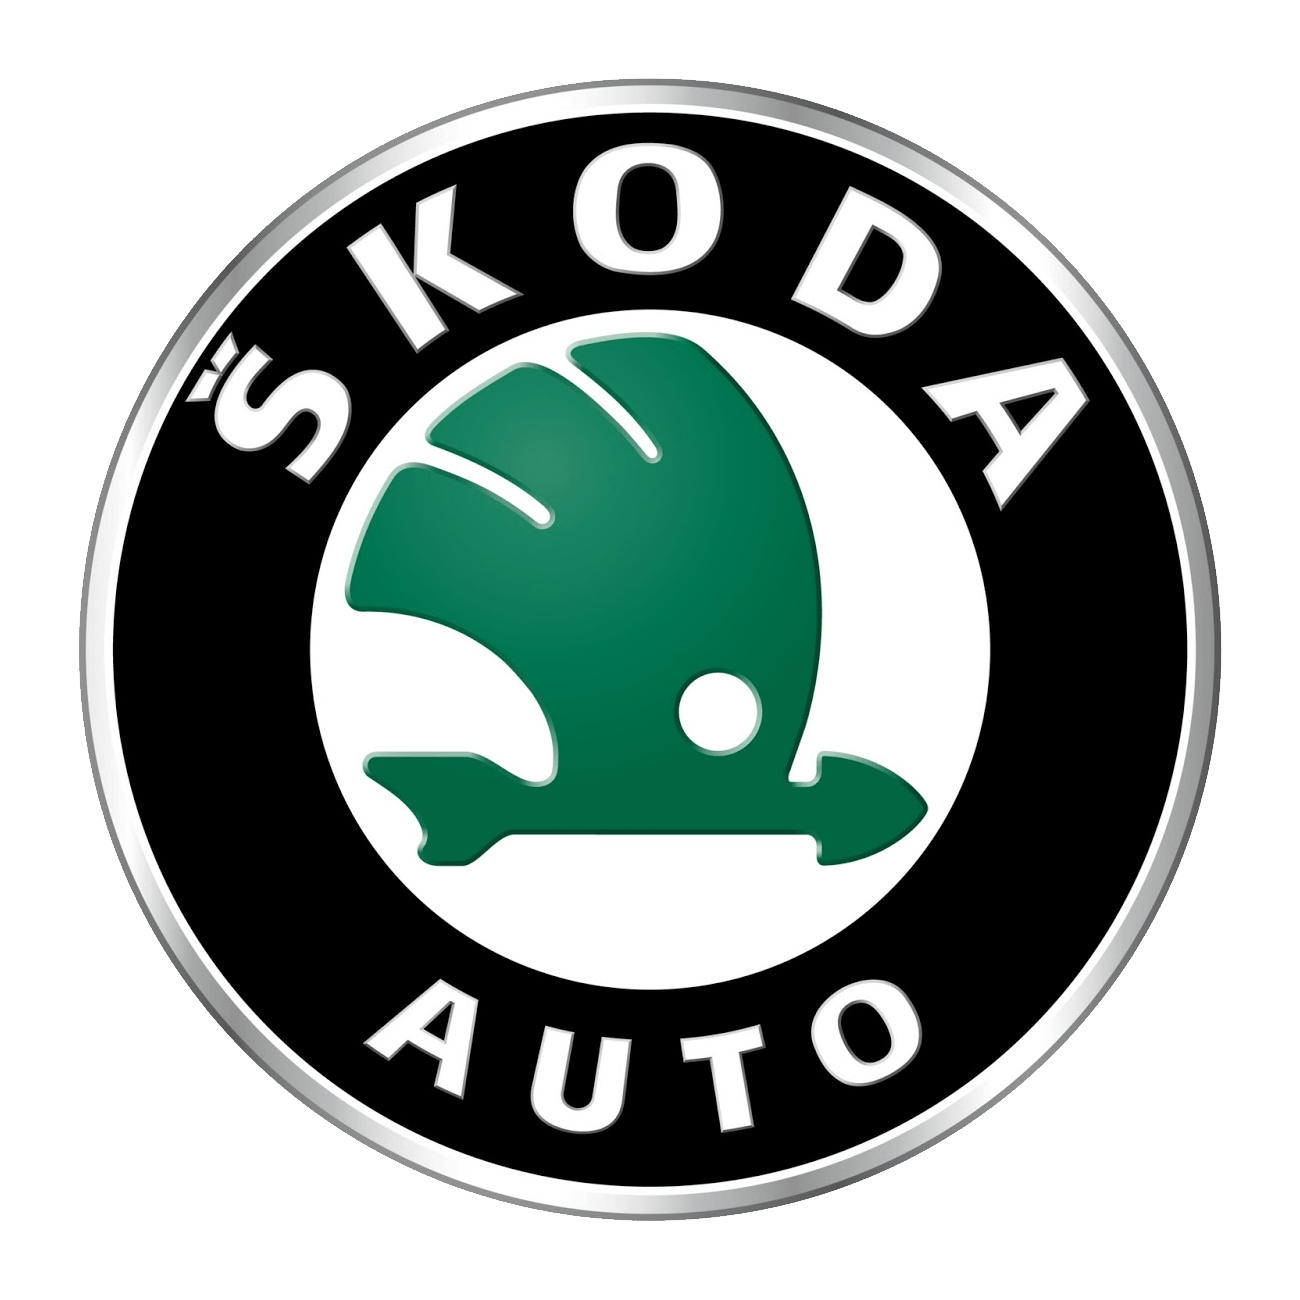 Skoda Octavia transparent PNG.